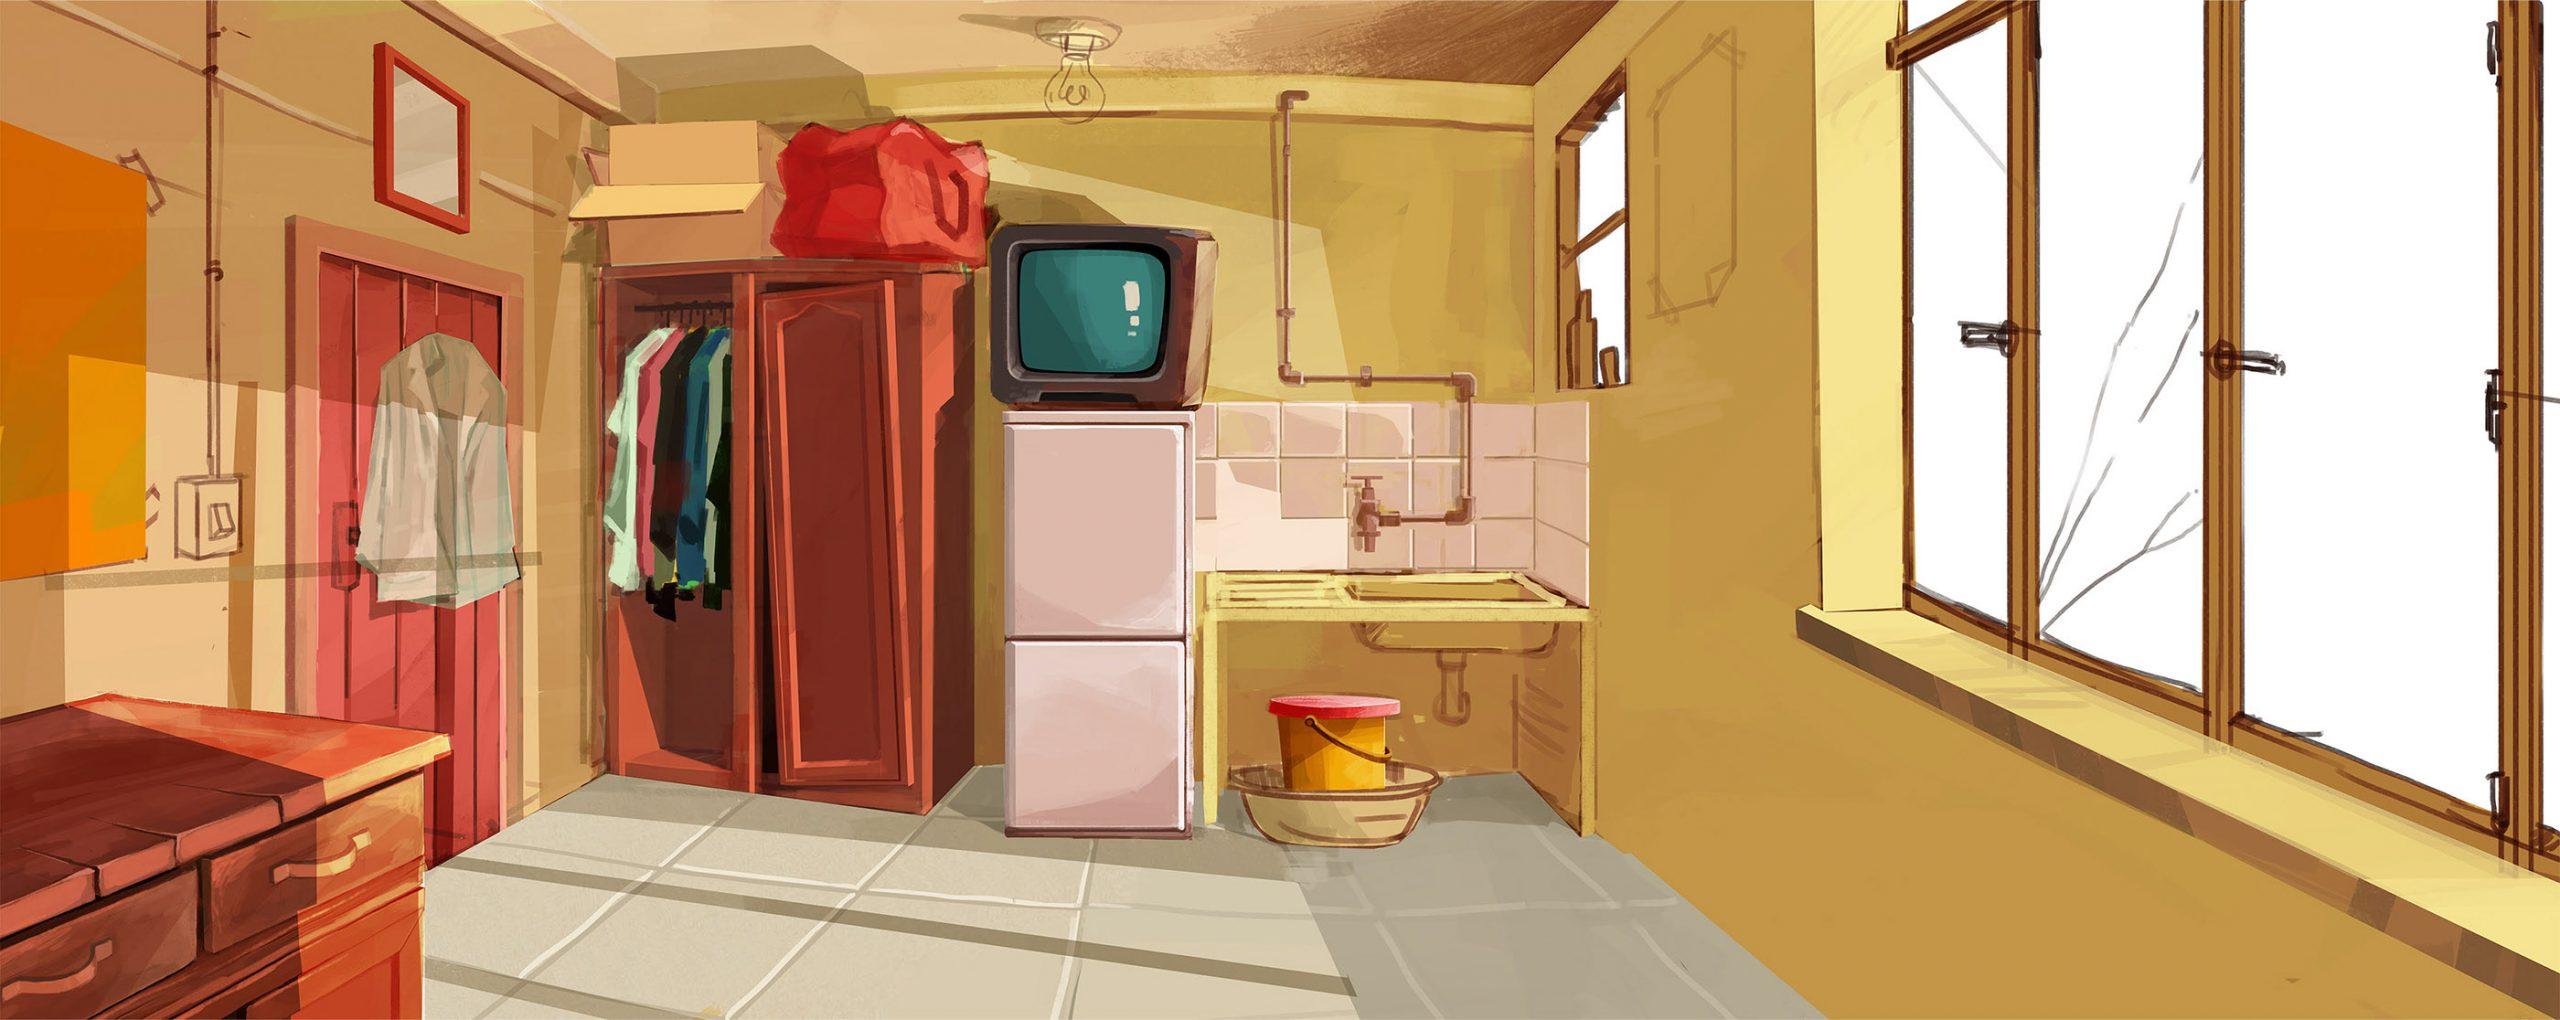 Illustration of a Johannesburg apartment by Mogau Kekana